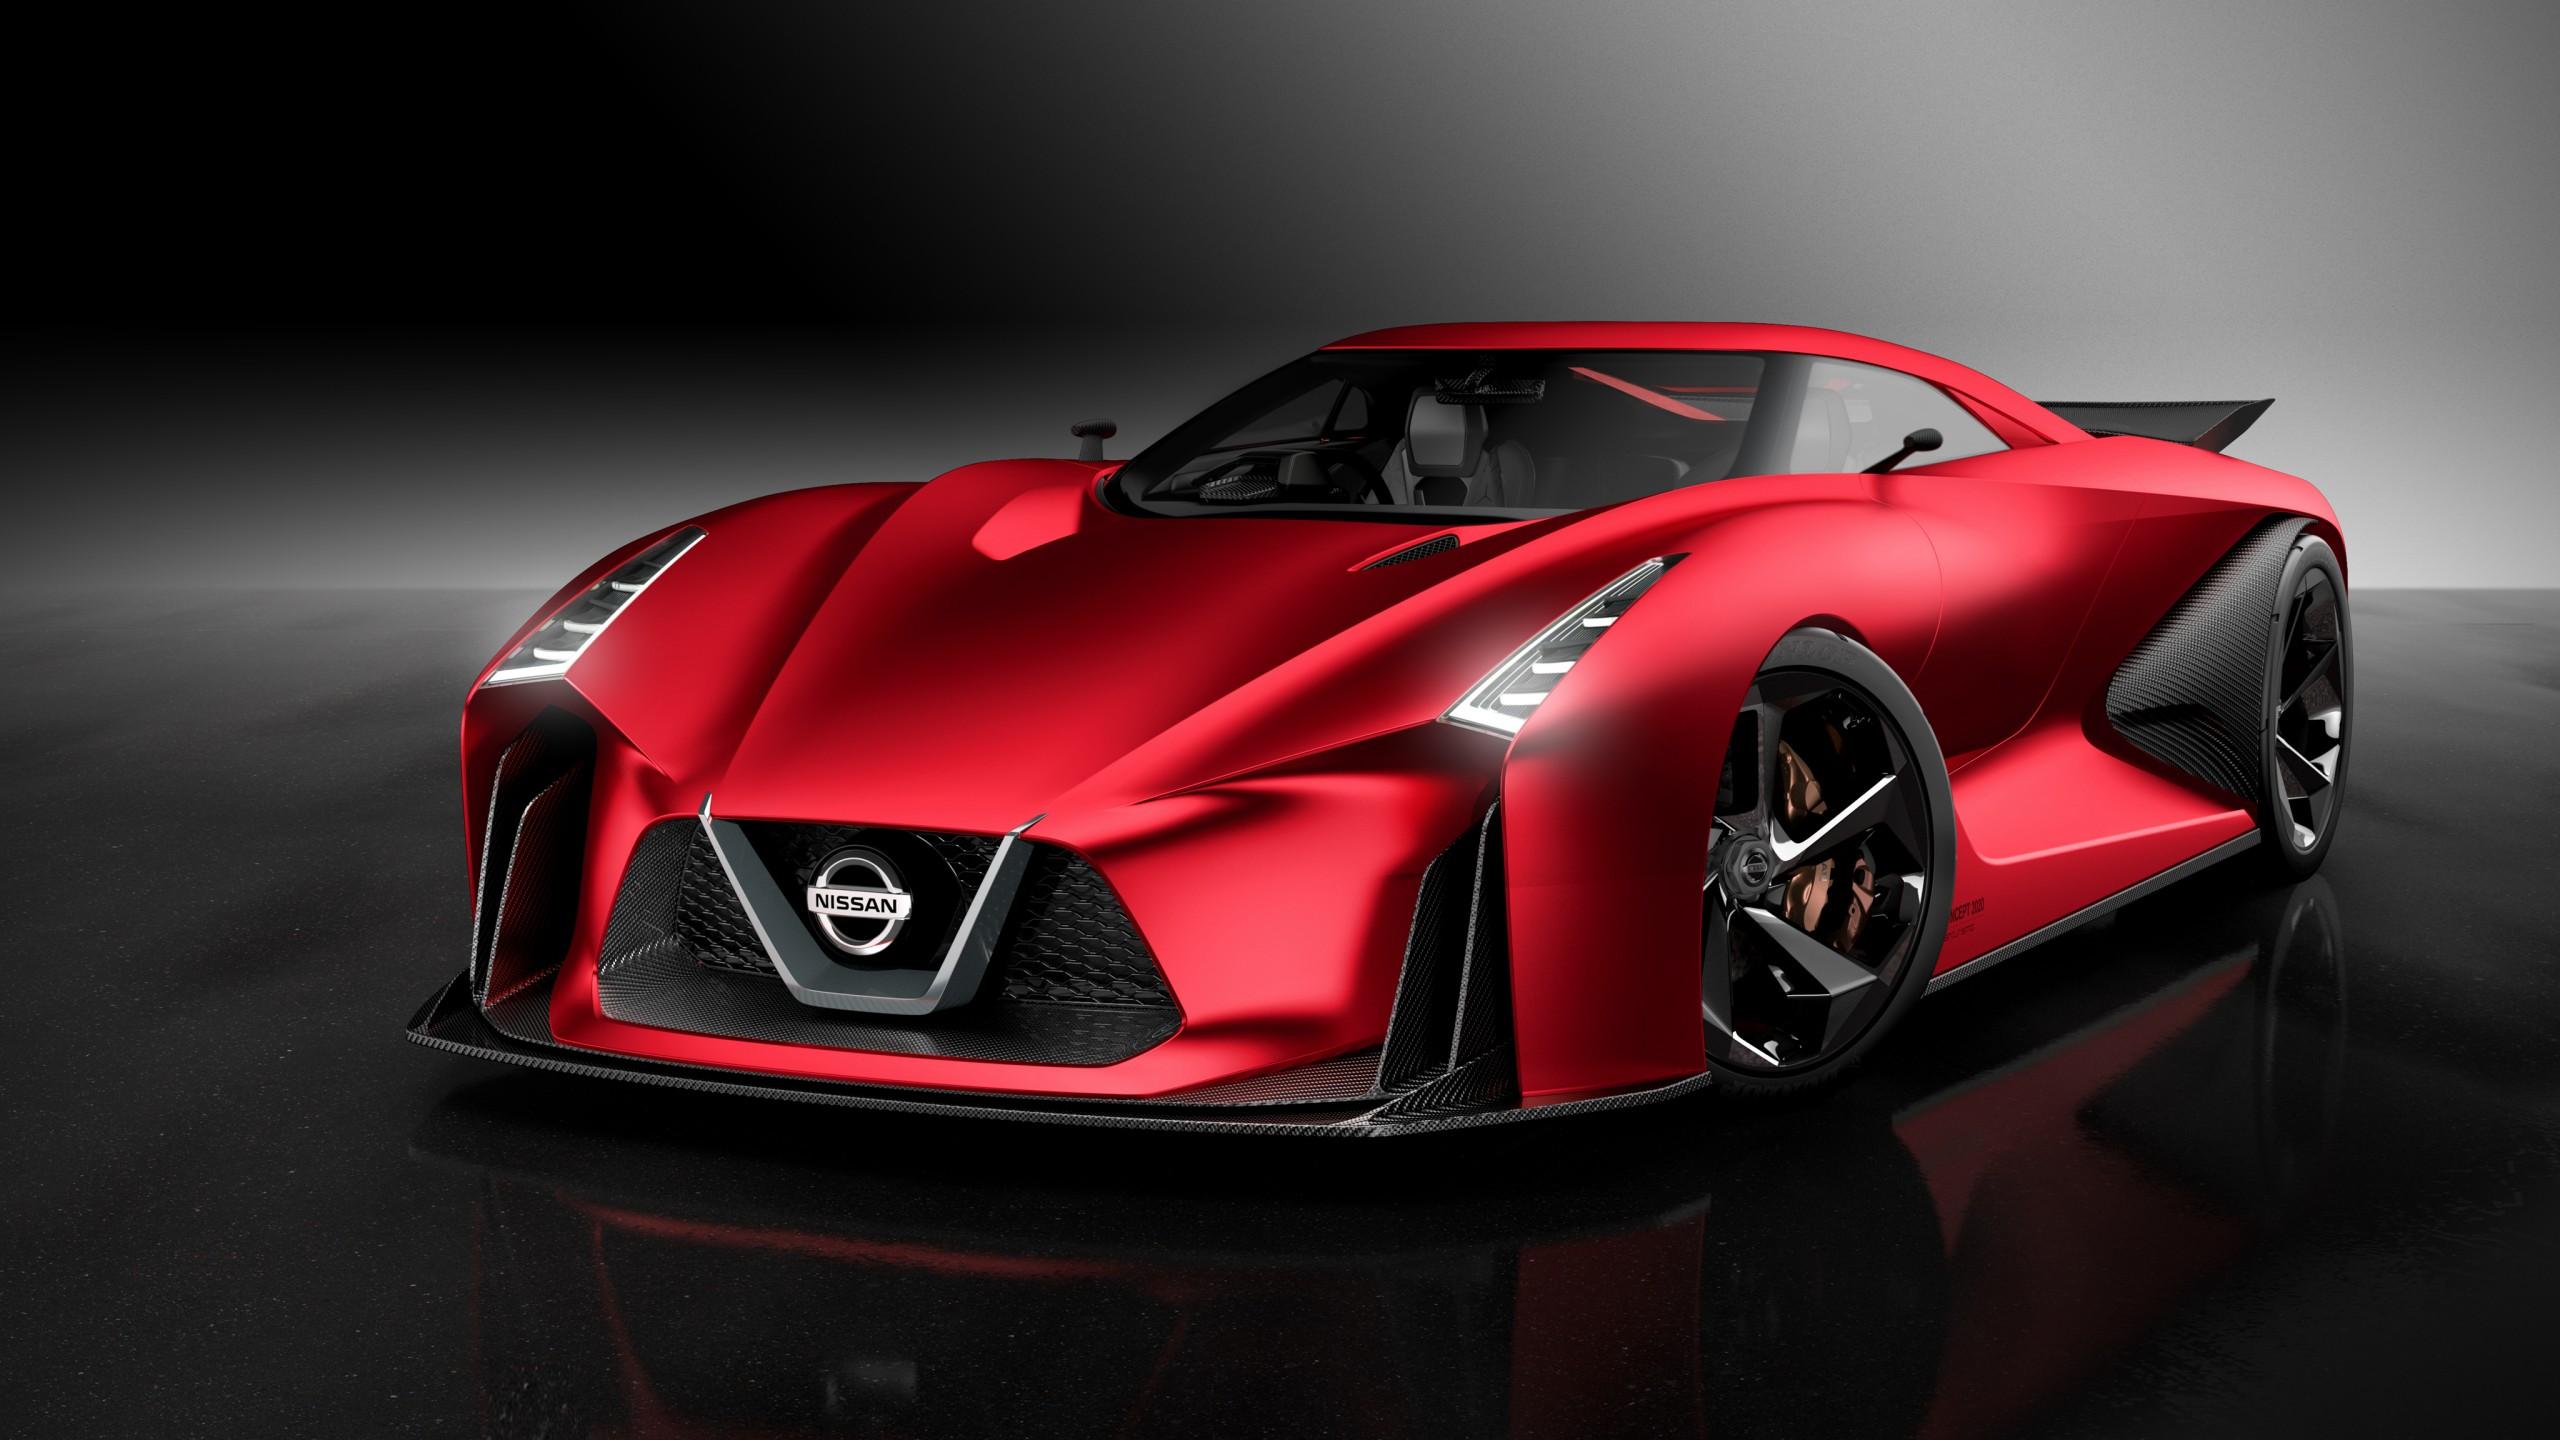 Dr Car: Wallpaper Nissan 2020 Vision Gran Turismo, Red, Concept